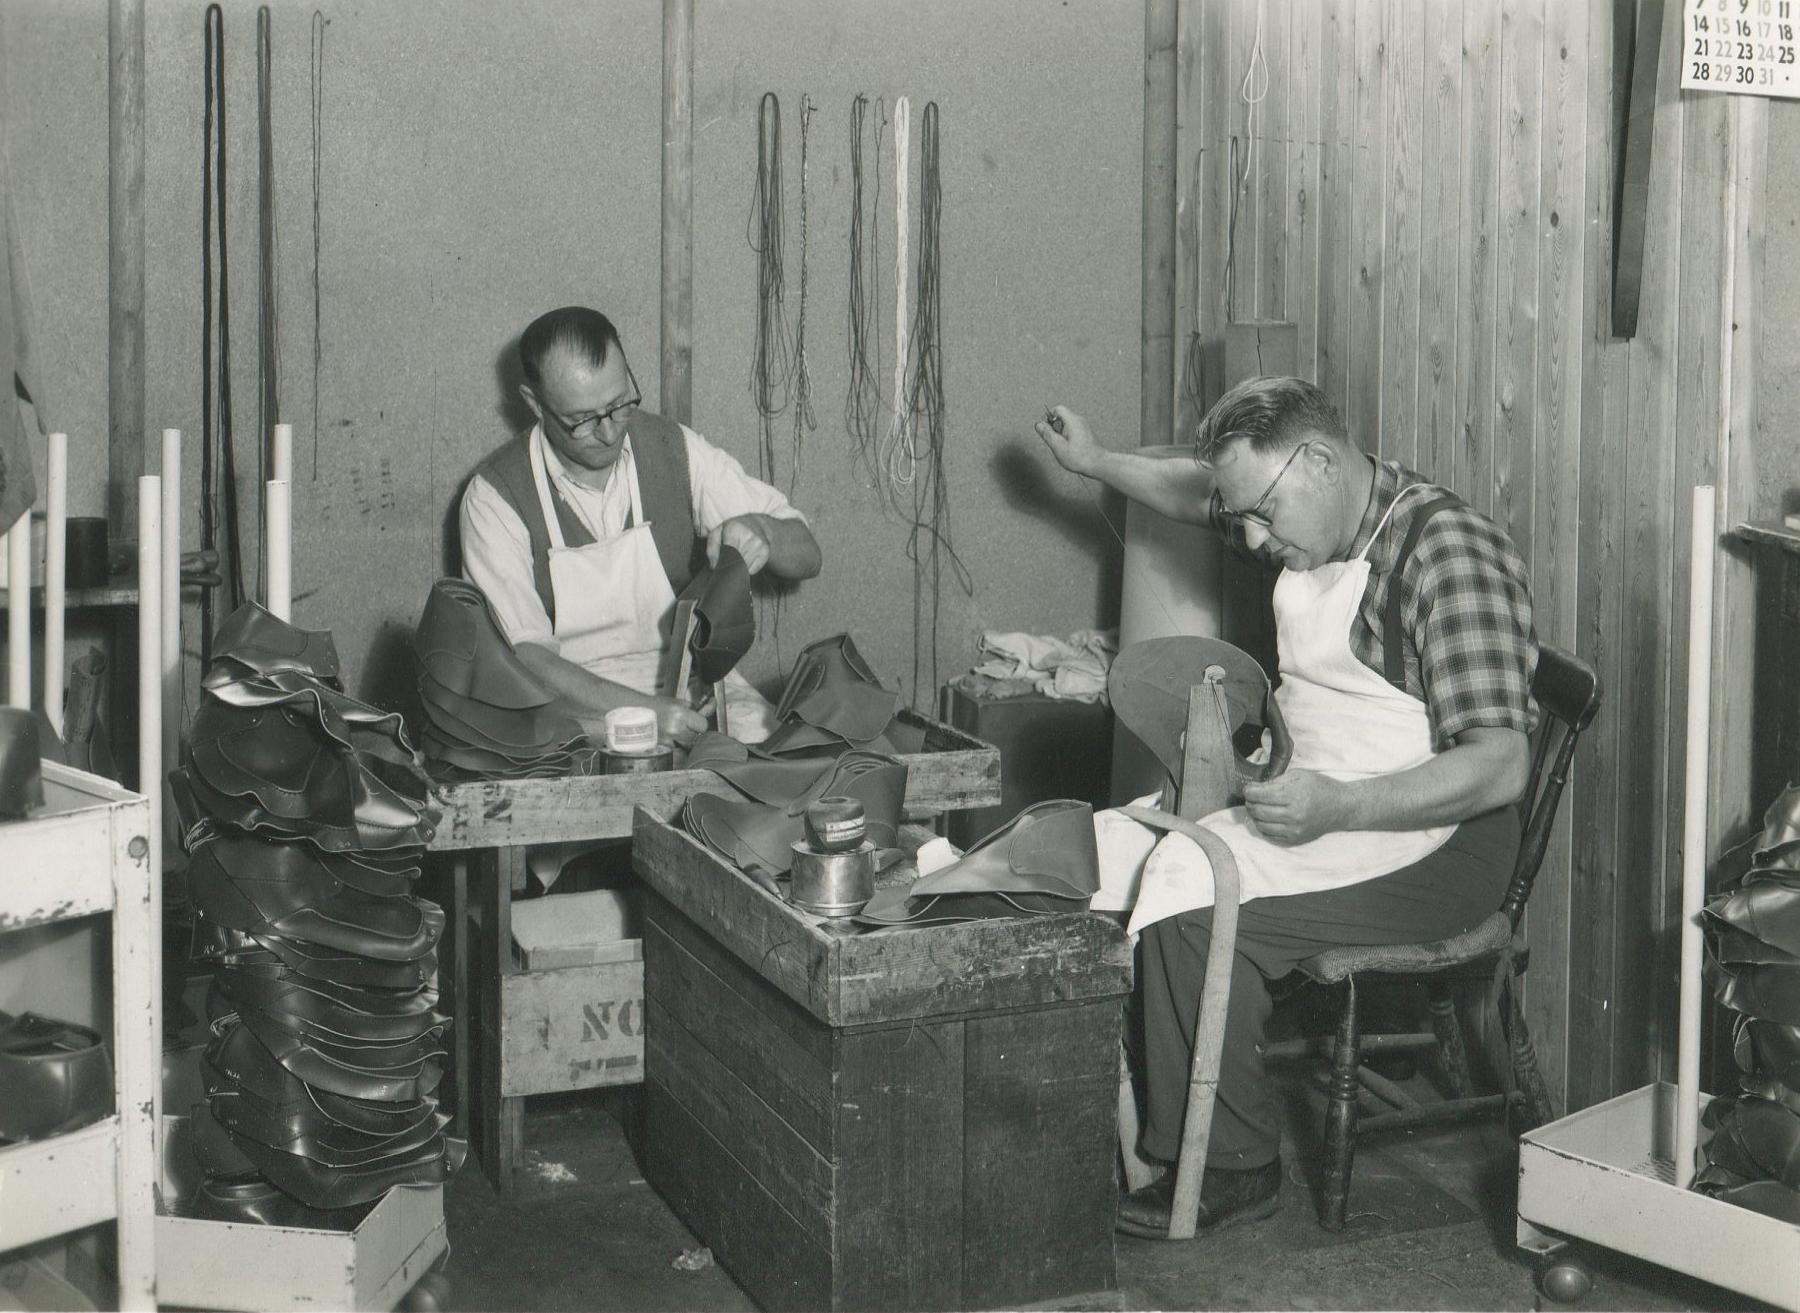 Grenson Celebrating 150 Years of British Craftsmanship